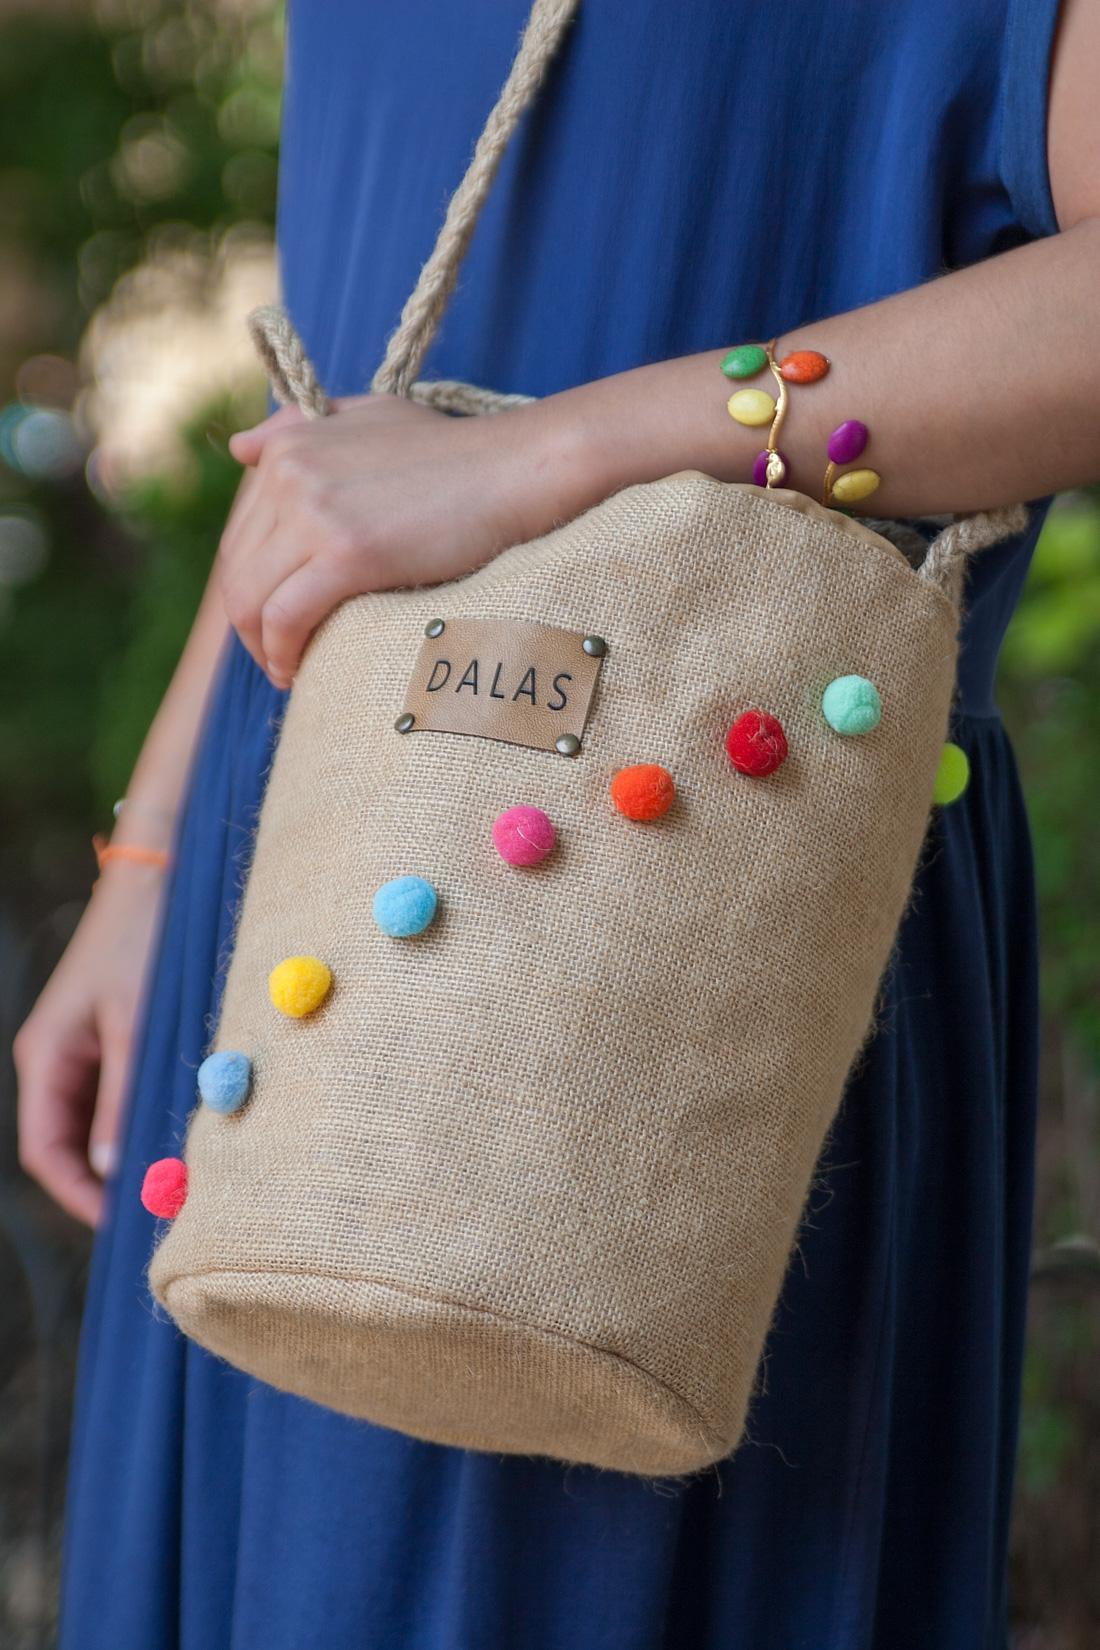 Detalle de bolso DALAS handmade.